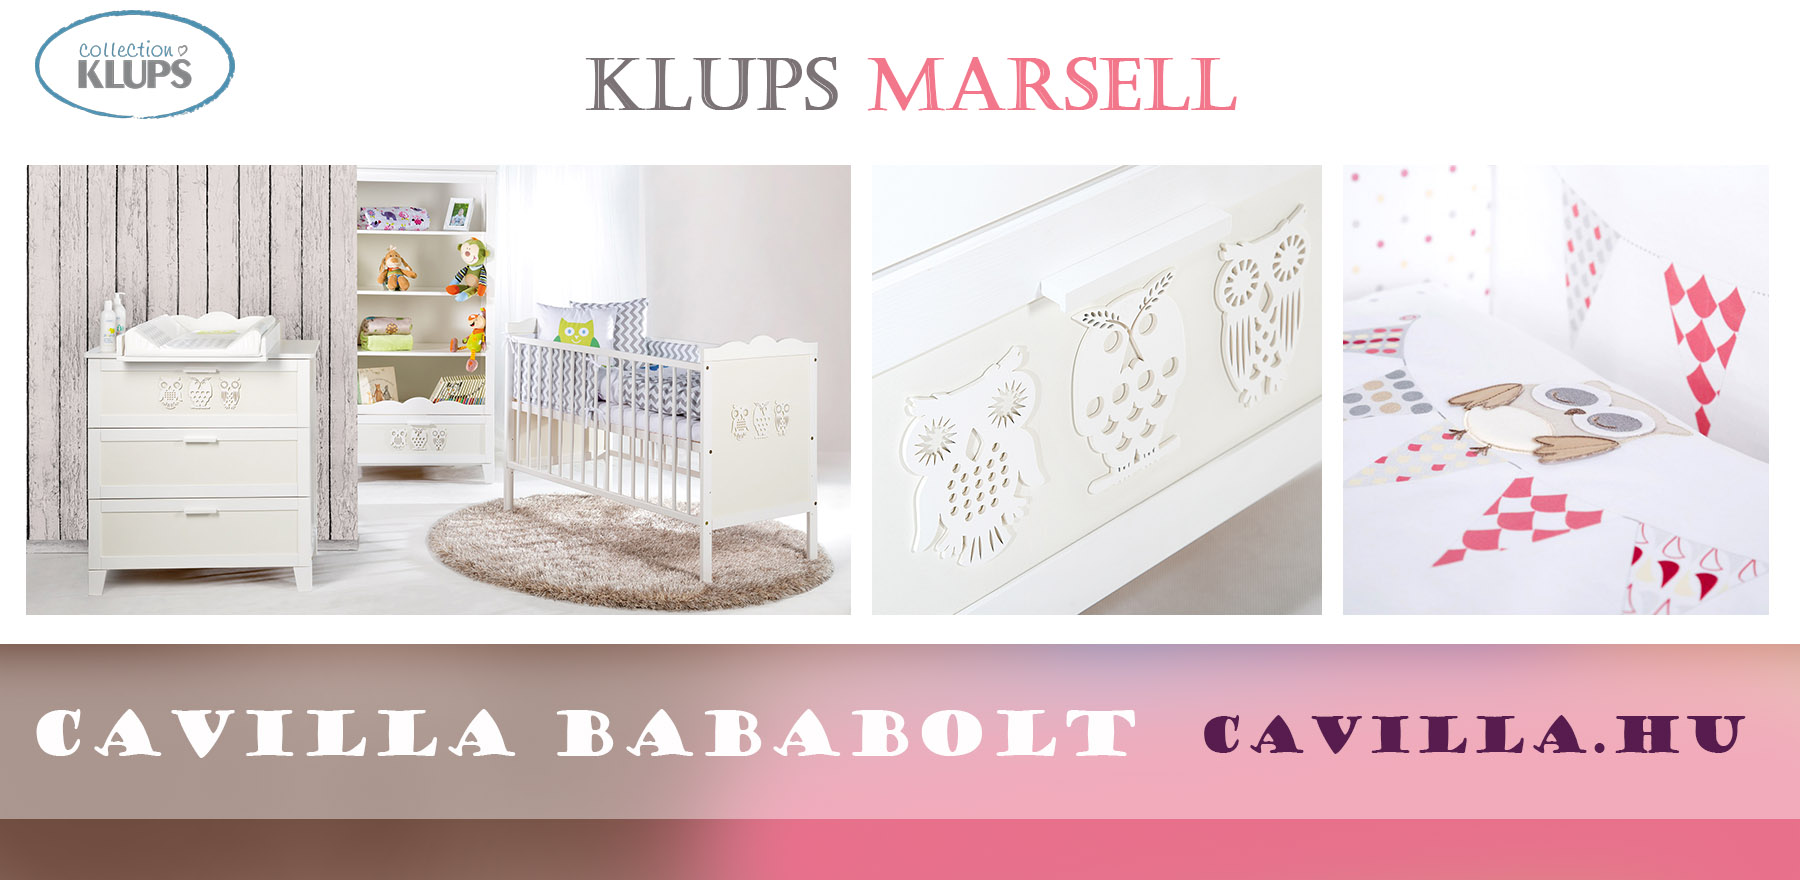 Cavilla Bababolt 0139235732